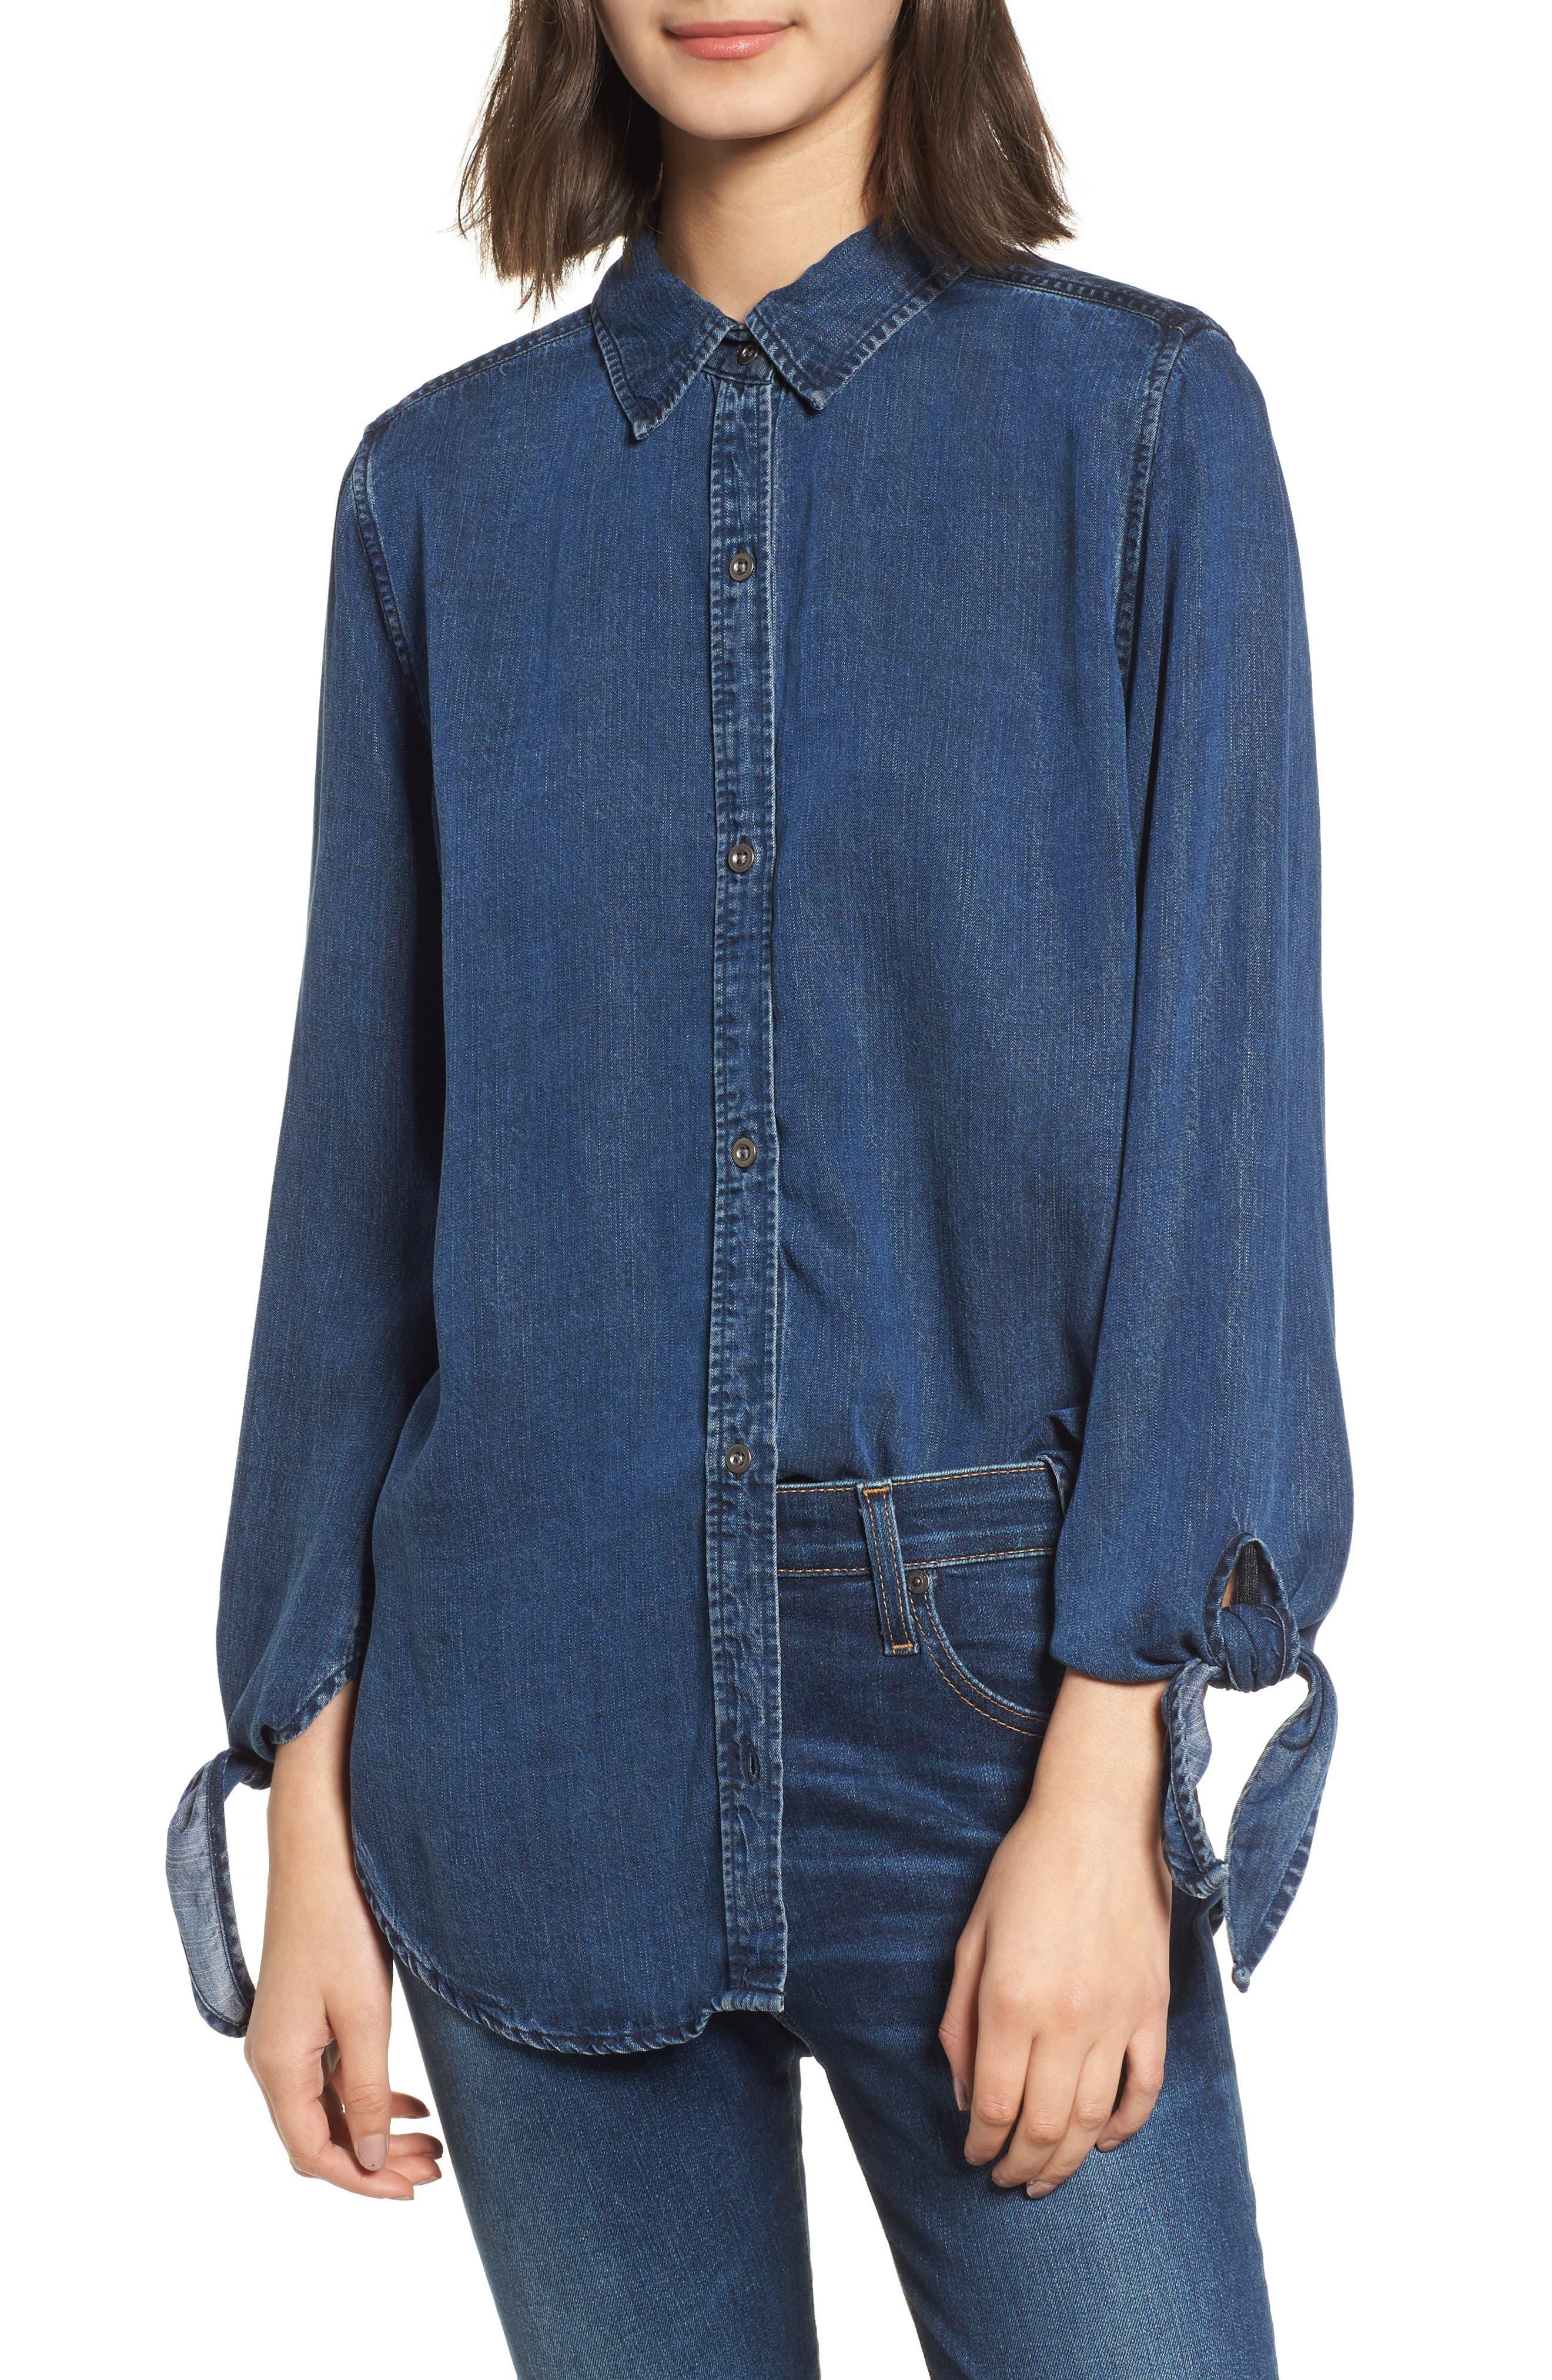 Bethany Tie Cuff Denim Shirt,                             Main thumbnail 1, color,                             Dark Vintage Wash